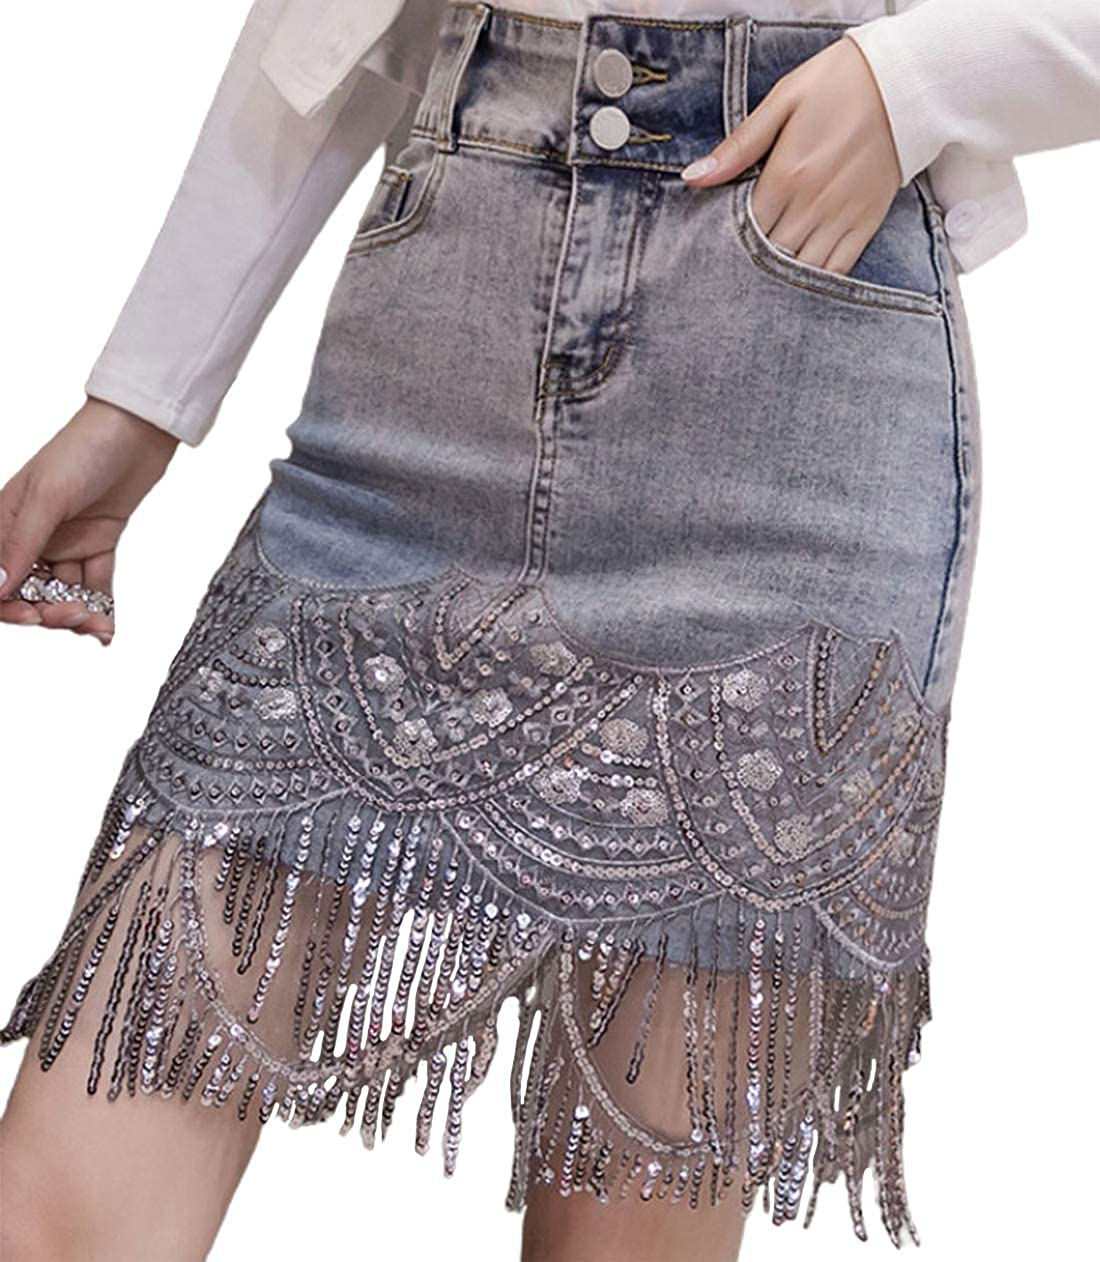 CHARTOU Women's Shiny Slim High Waist Sparkle Sequin Tassel Denim Bodycon Midi Pencil Skirt